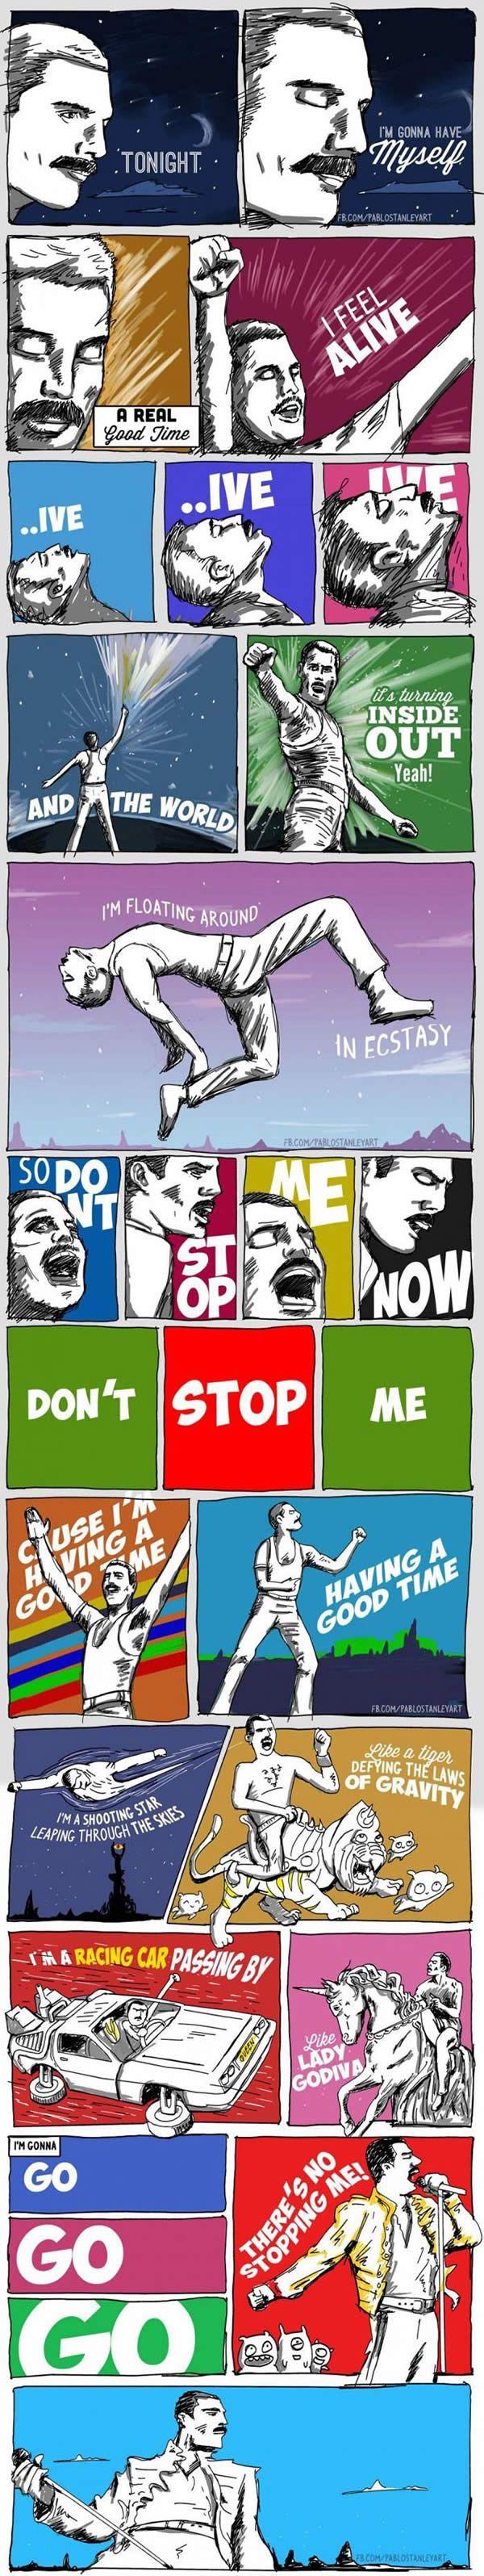 Don't stop me now. <3 Freddie